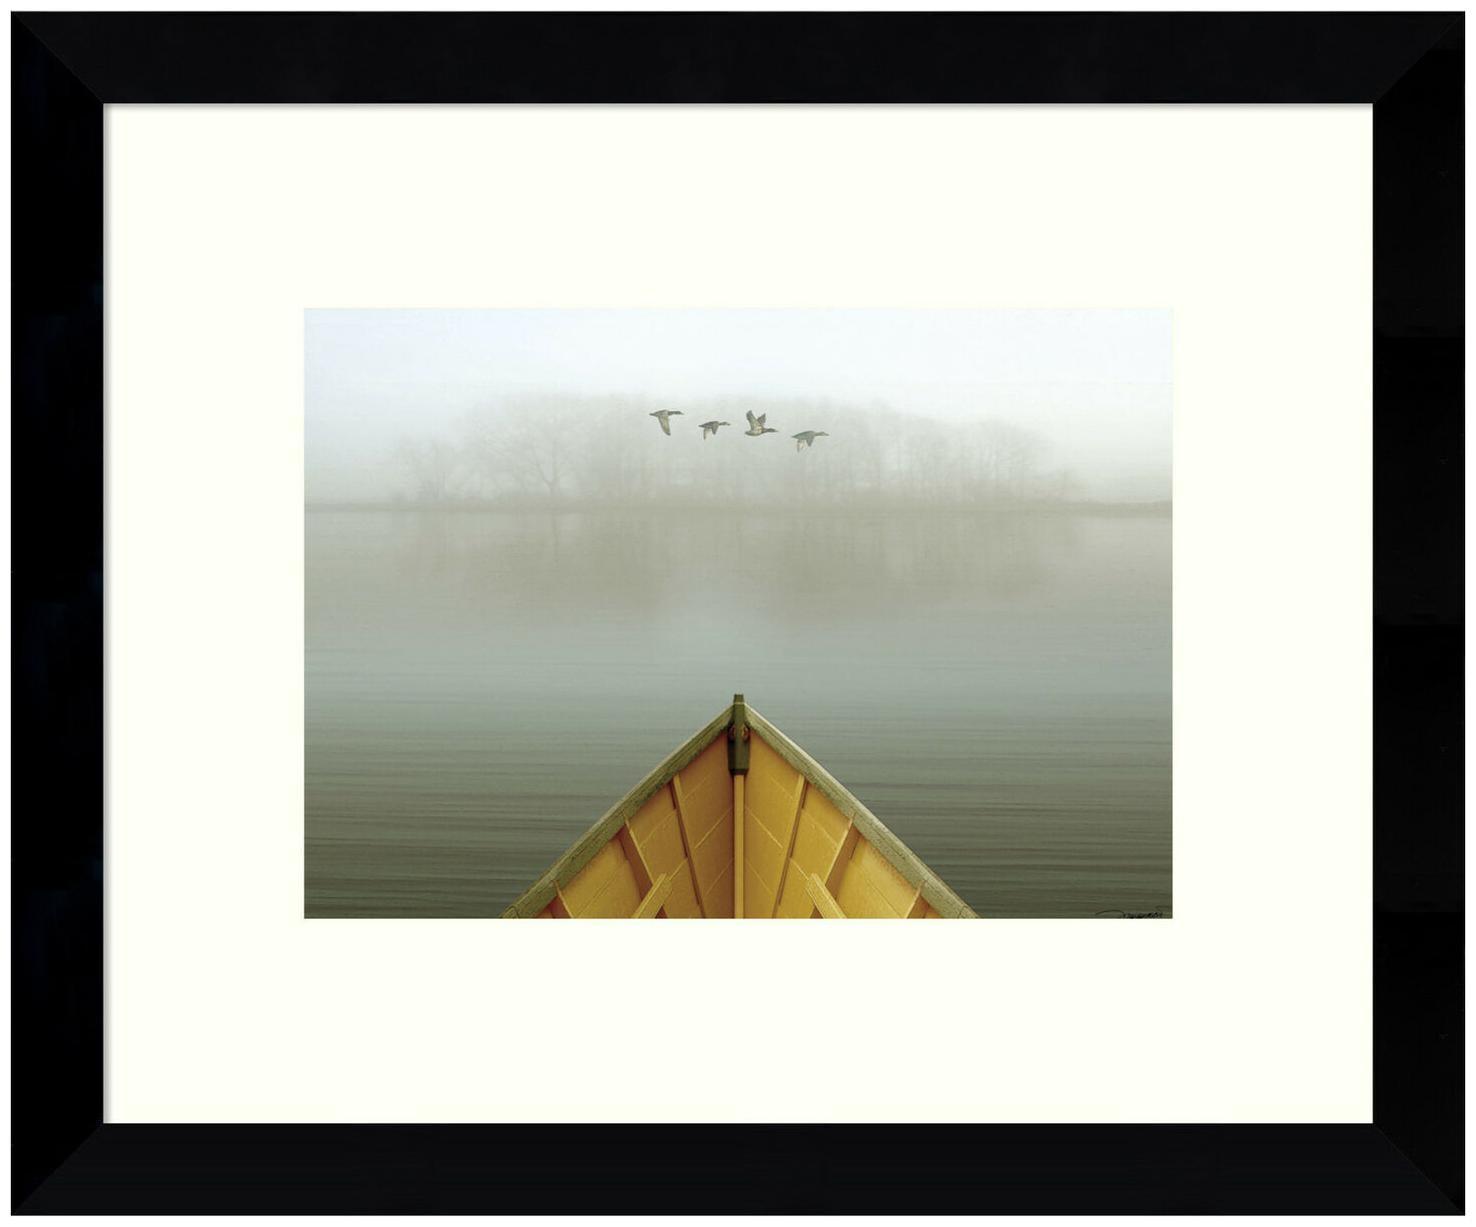 Amanti Art DSW3422398 8 7/8 Inch x 10 7/8 Inch  Alone in the Mist